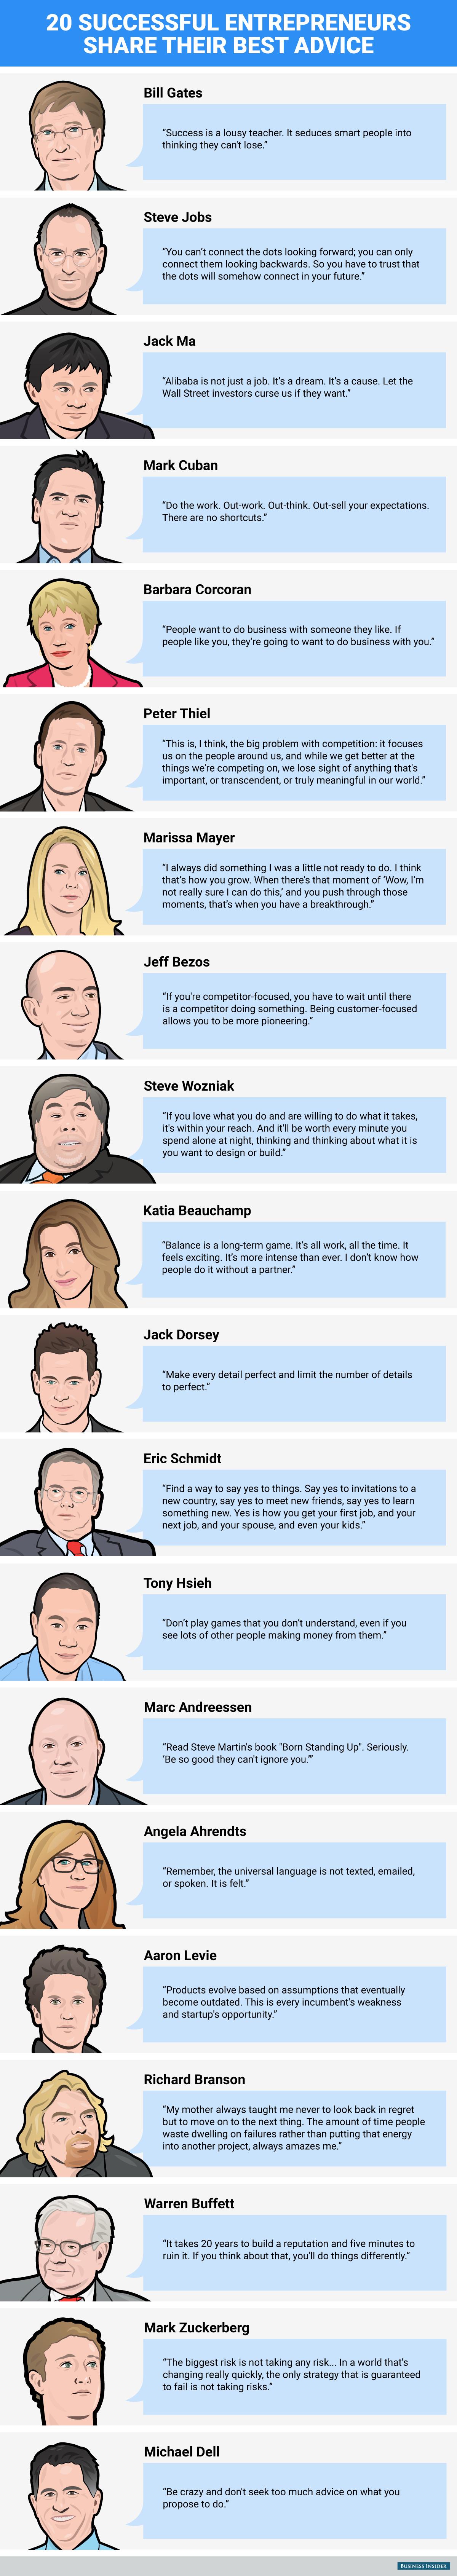 bi_graphics_successful-entrepreneurs-best-advice-2015.png